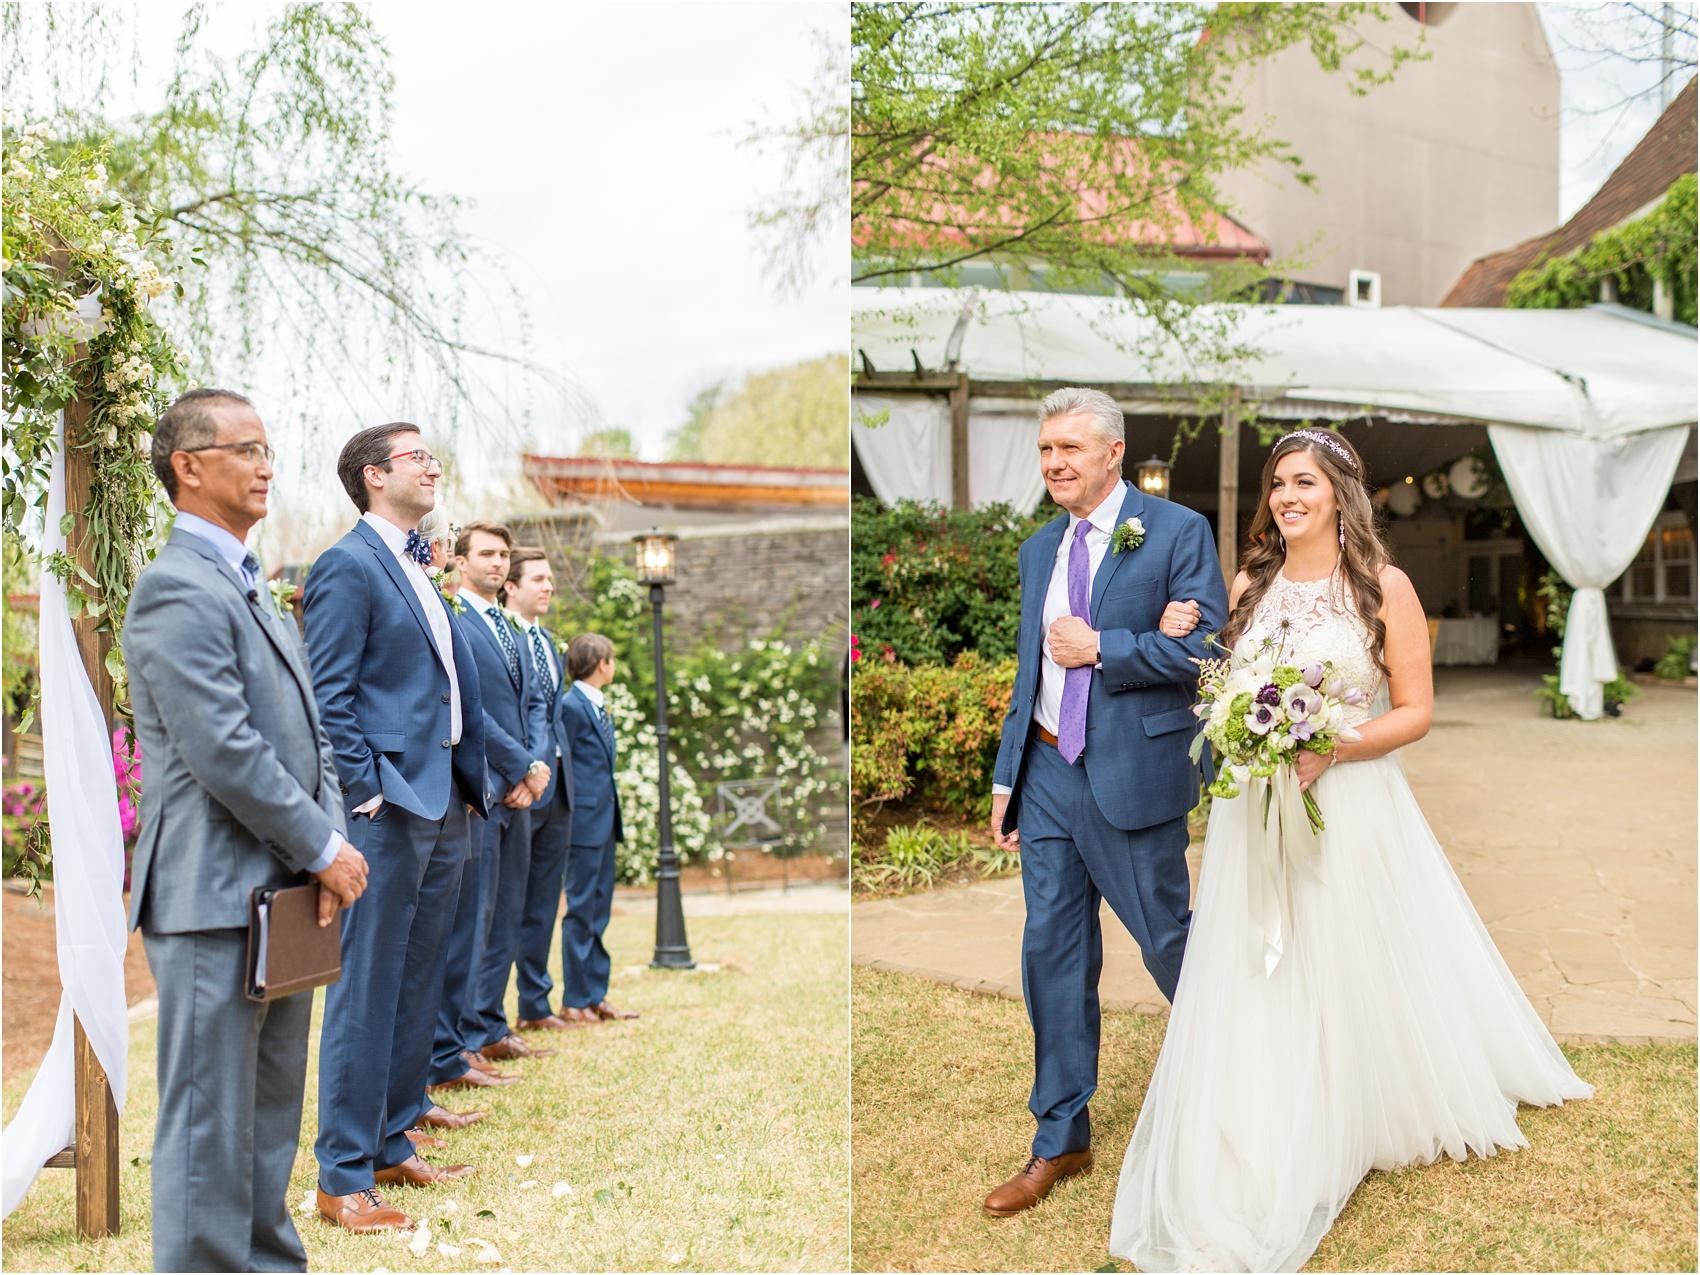 Savannah Eve Photography- Groseclose Wedding- Blog-50.jpg